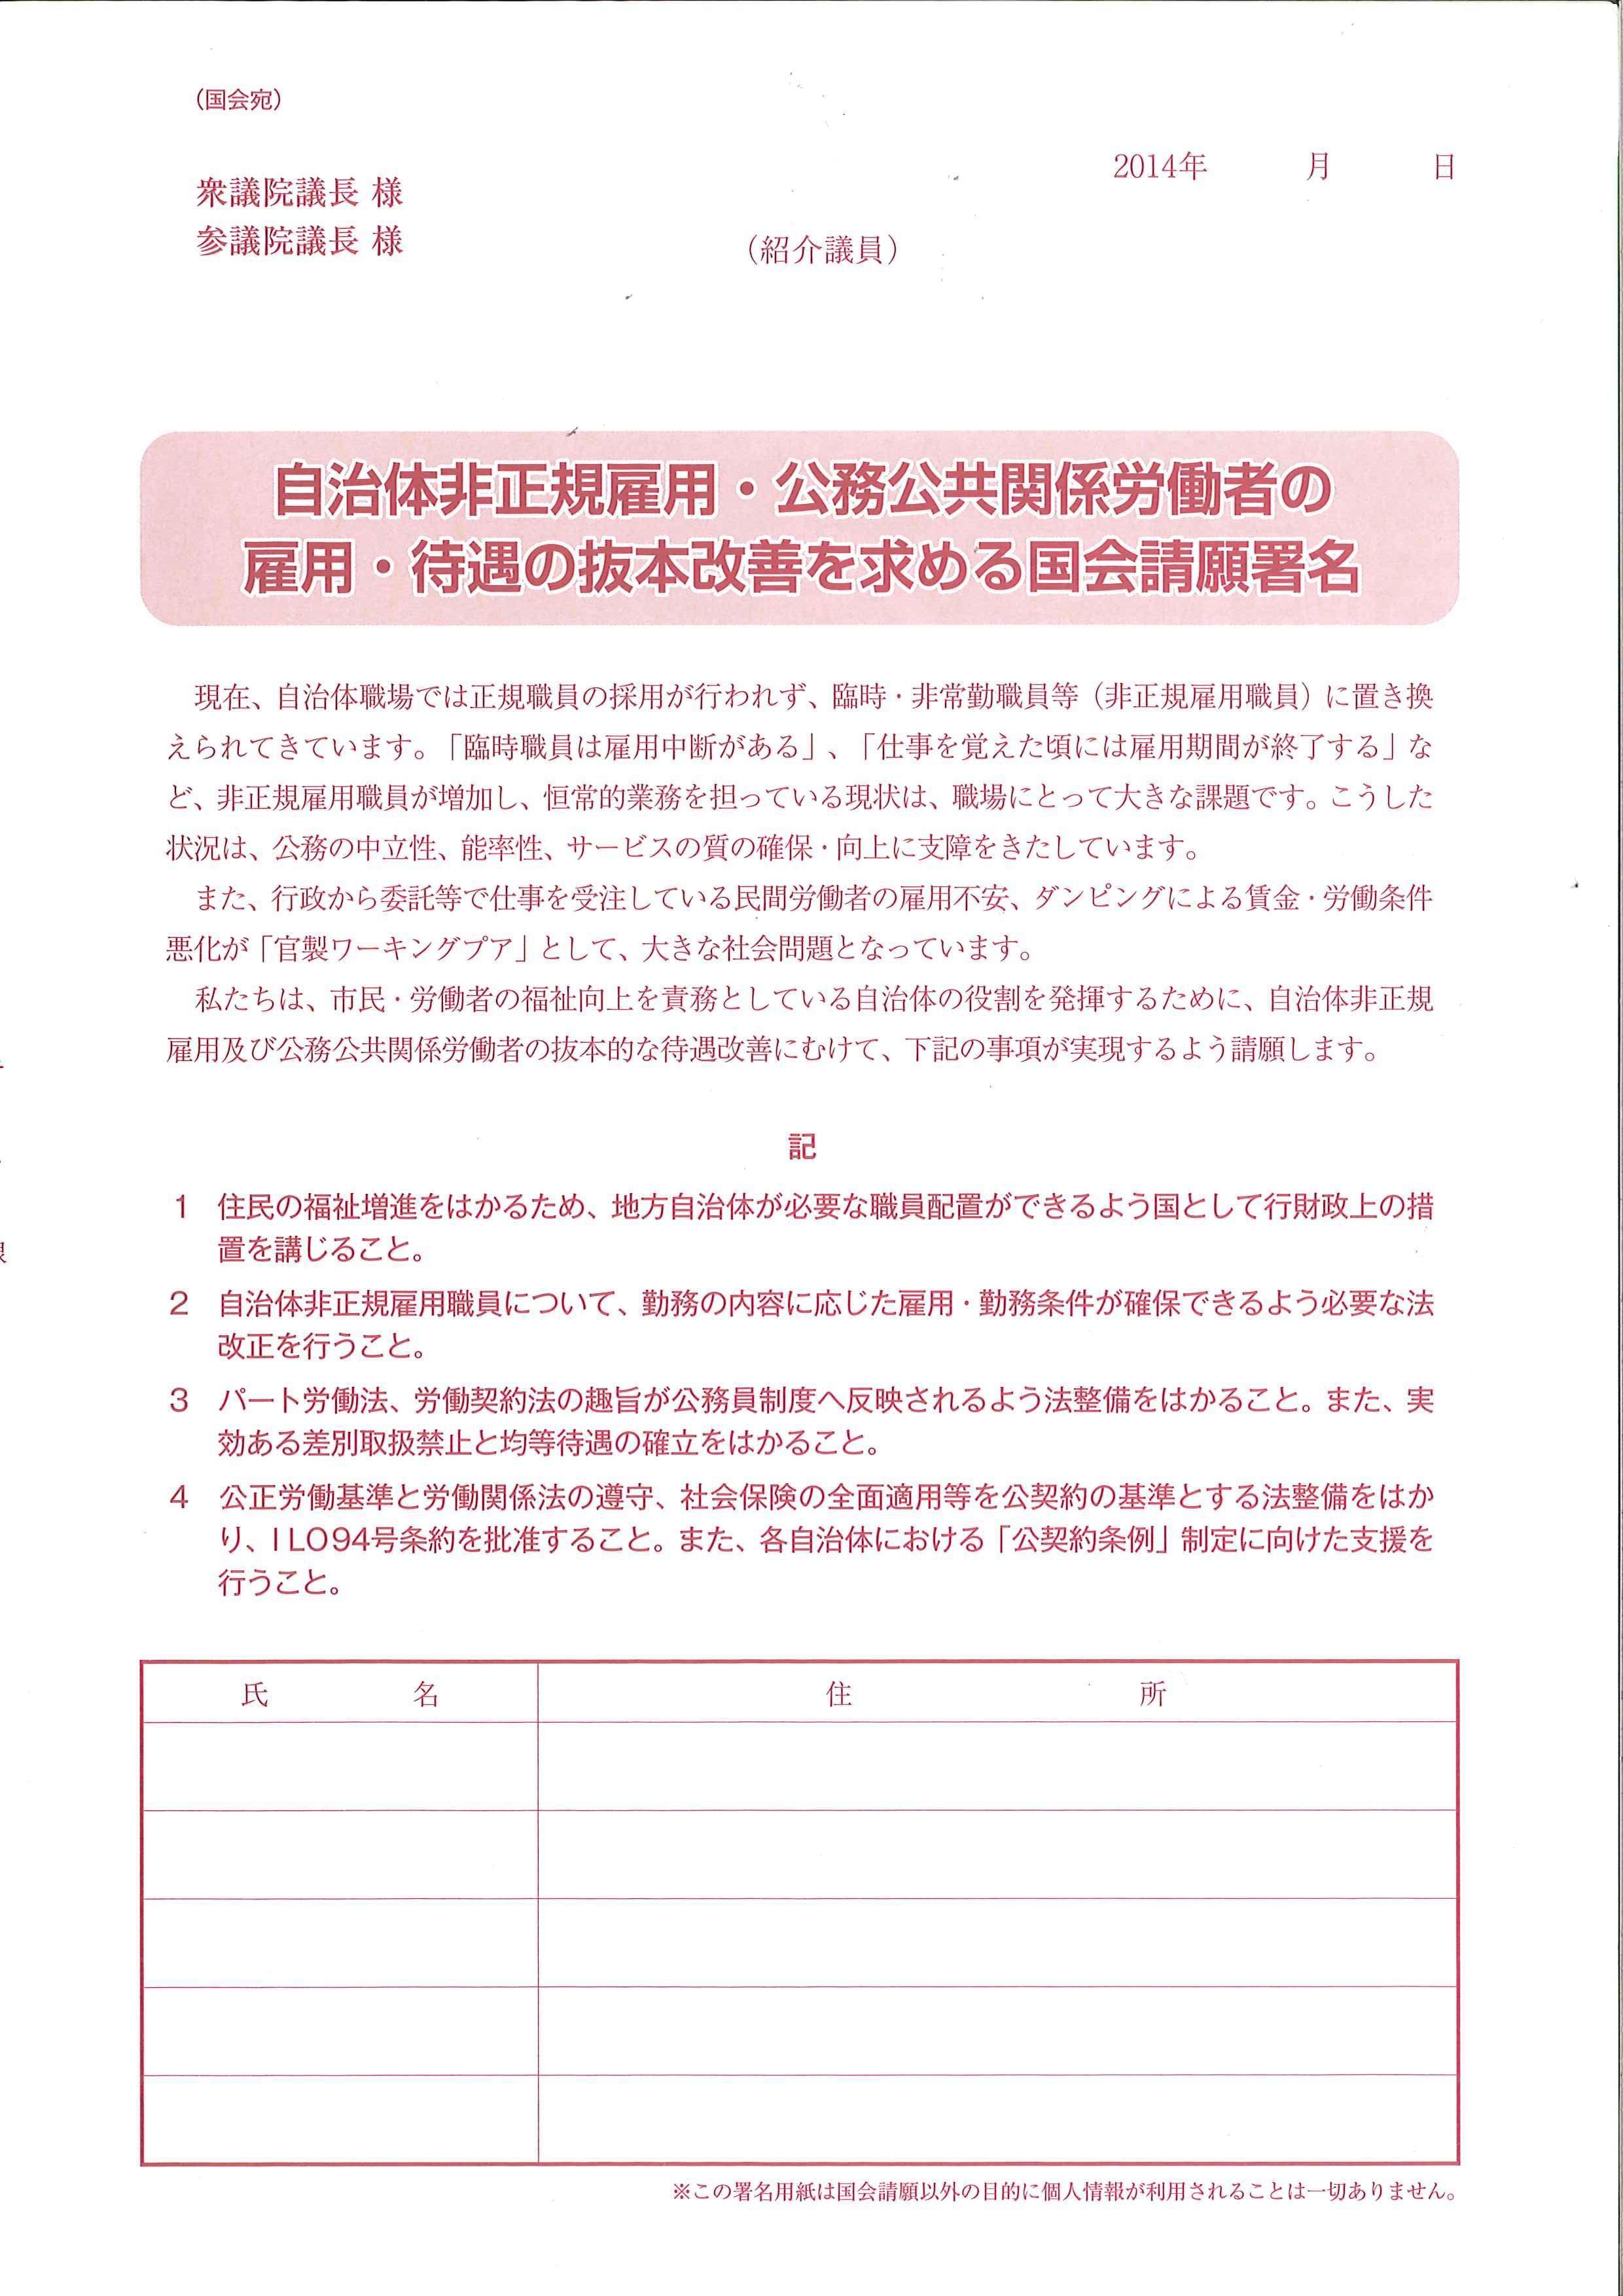 自治体非正規雇用・公務公共関係労働者の雇用・待遇の抜本改善を求める国会請願署名